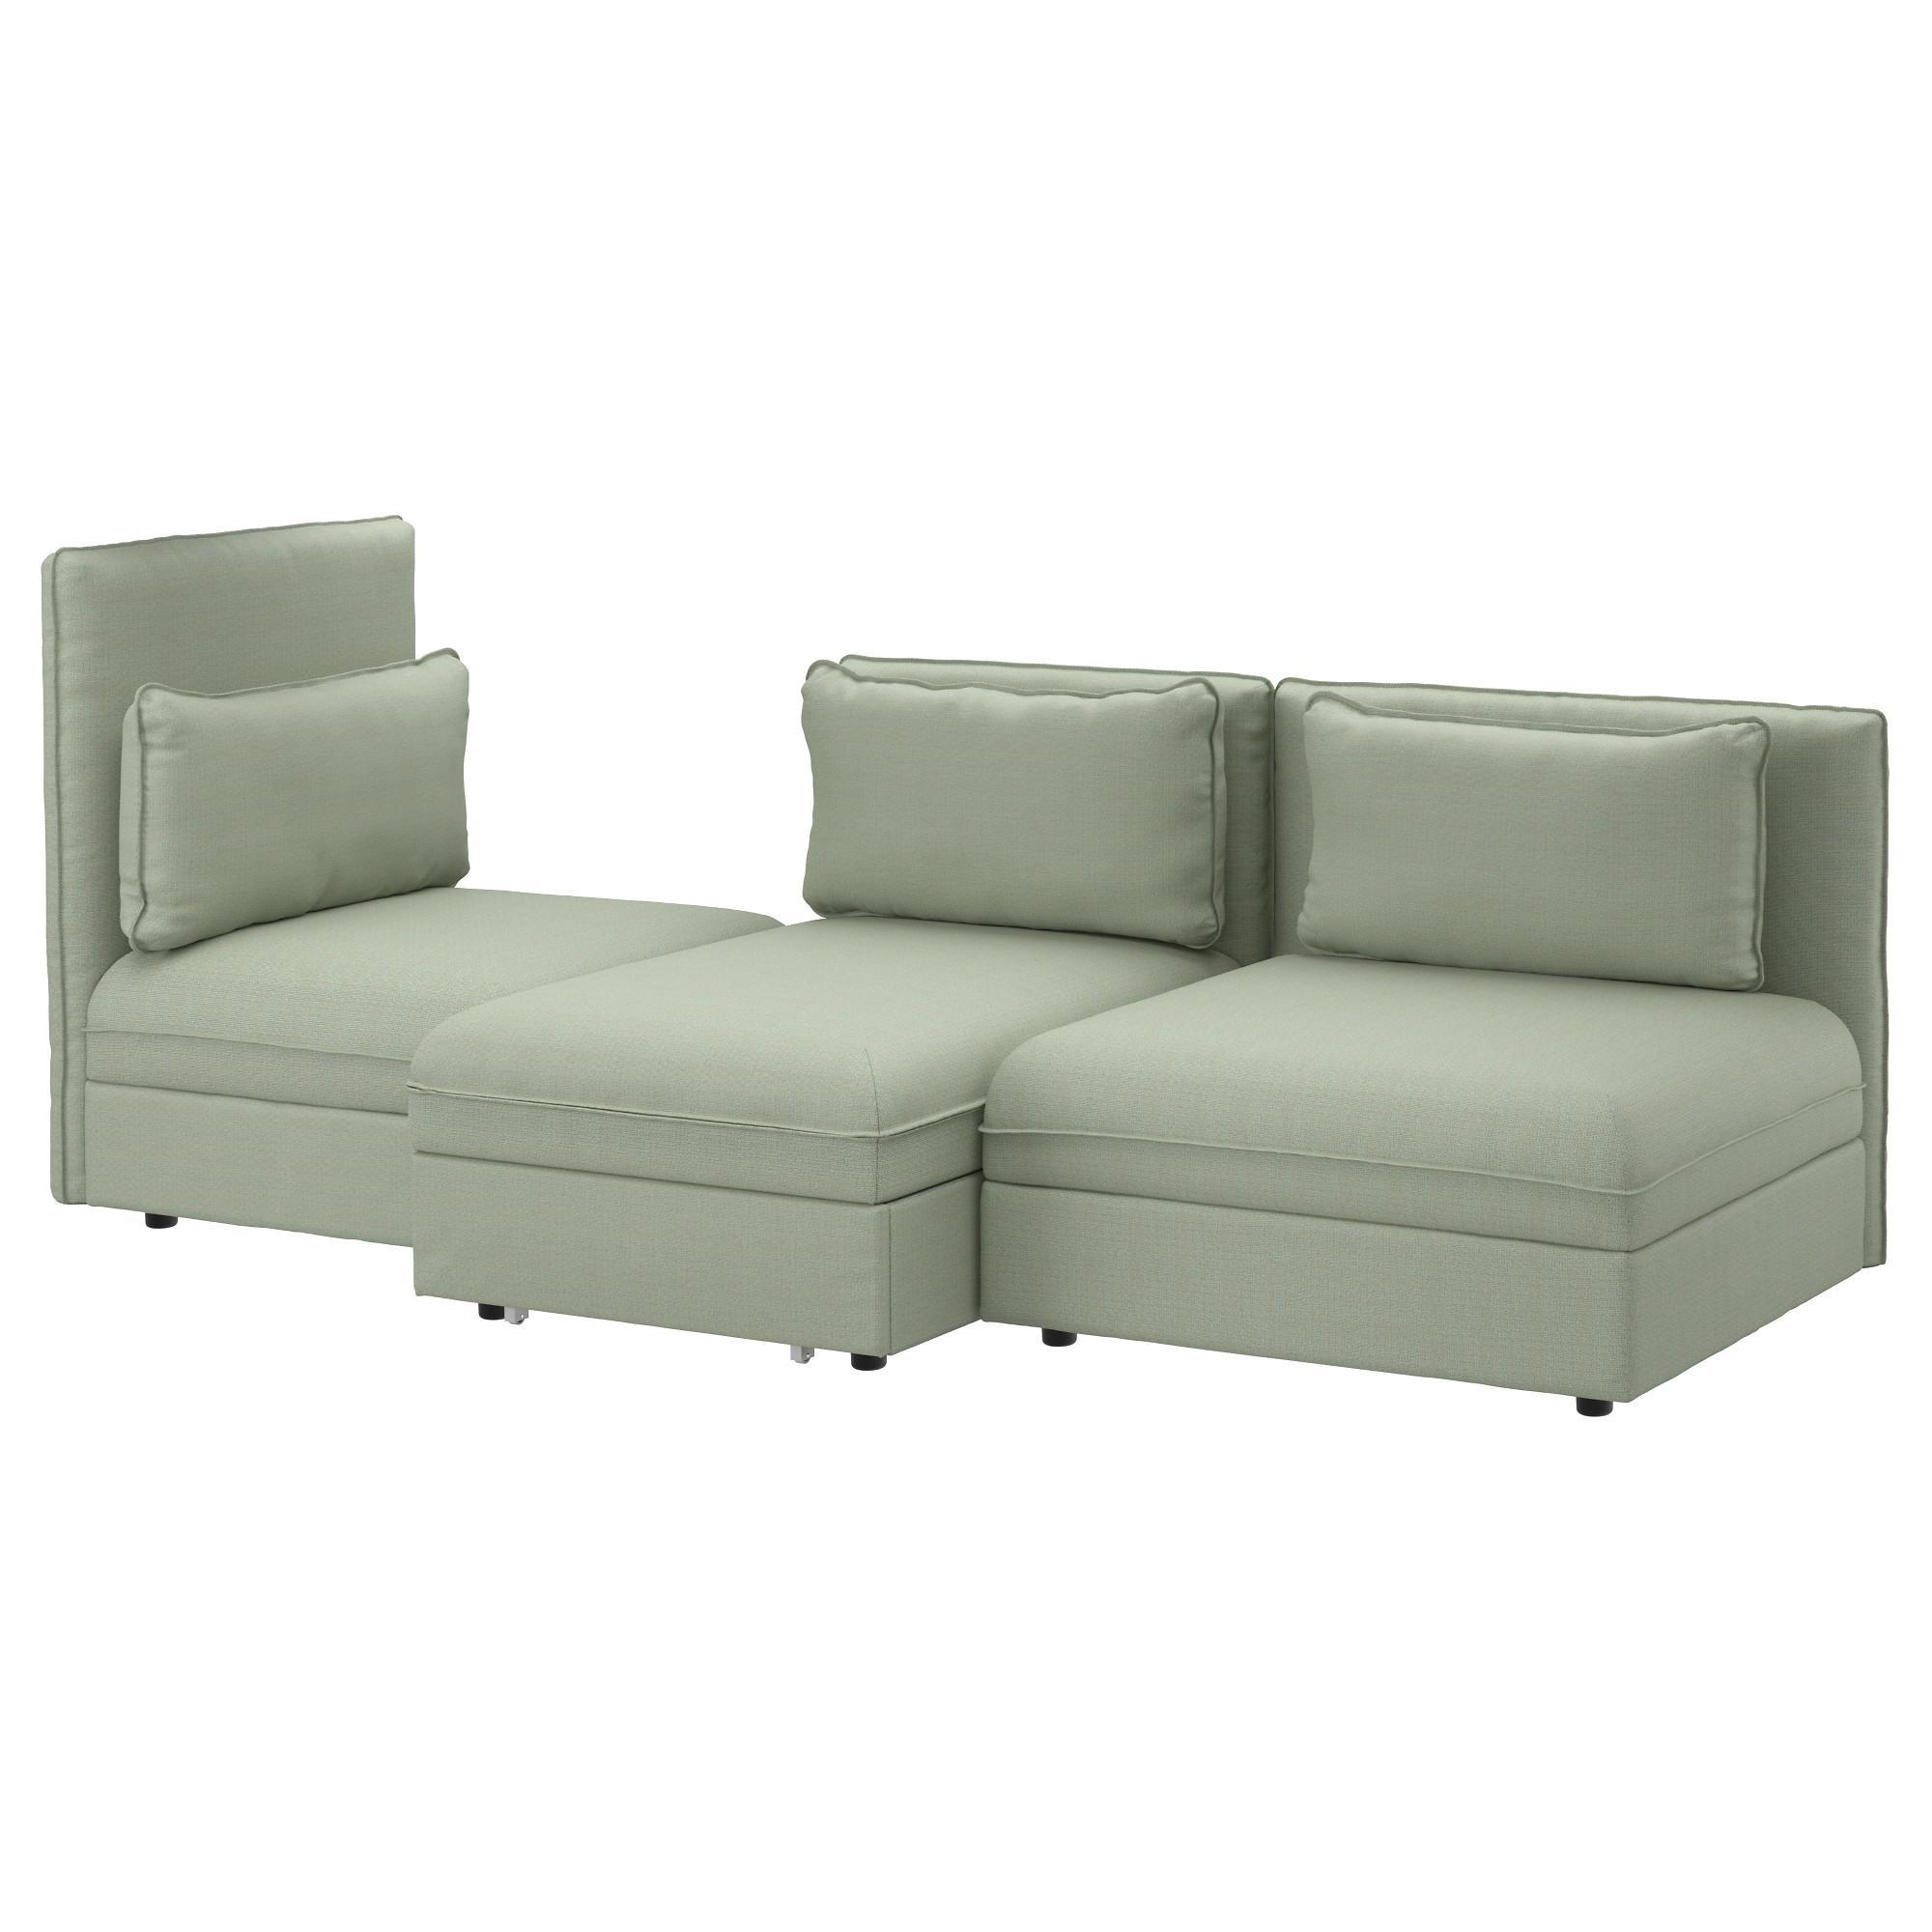 Sofa Beds & Futons – Ikea Throughout Ikea Sleeper Sofa Sectional (Image 16 of 20)